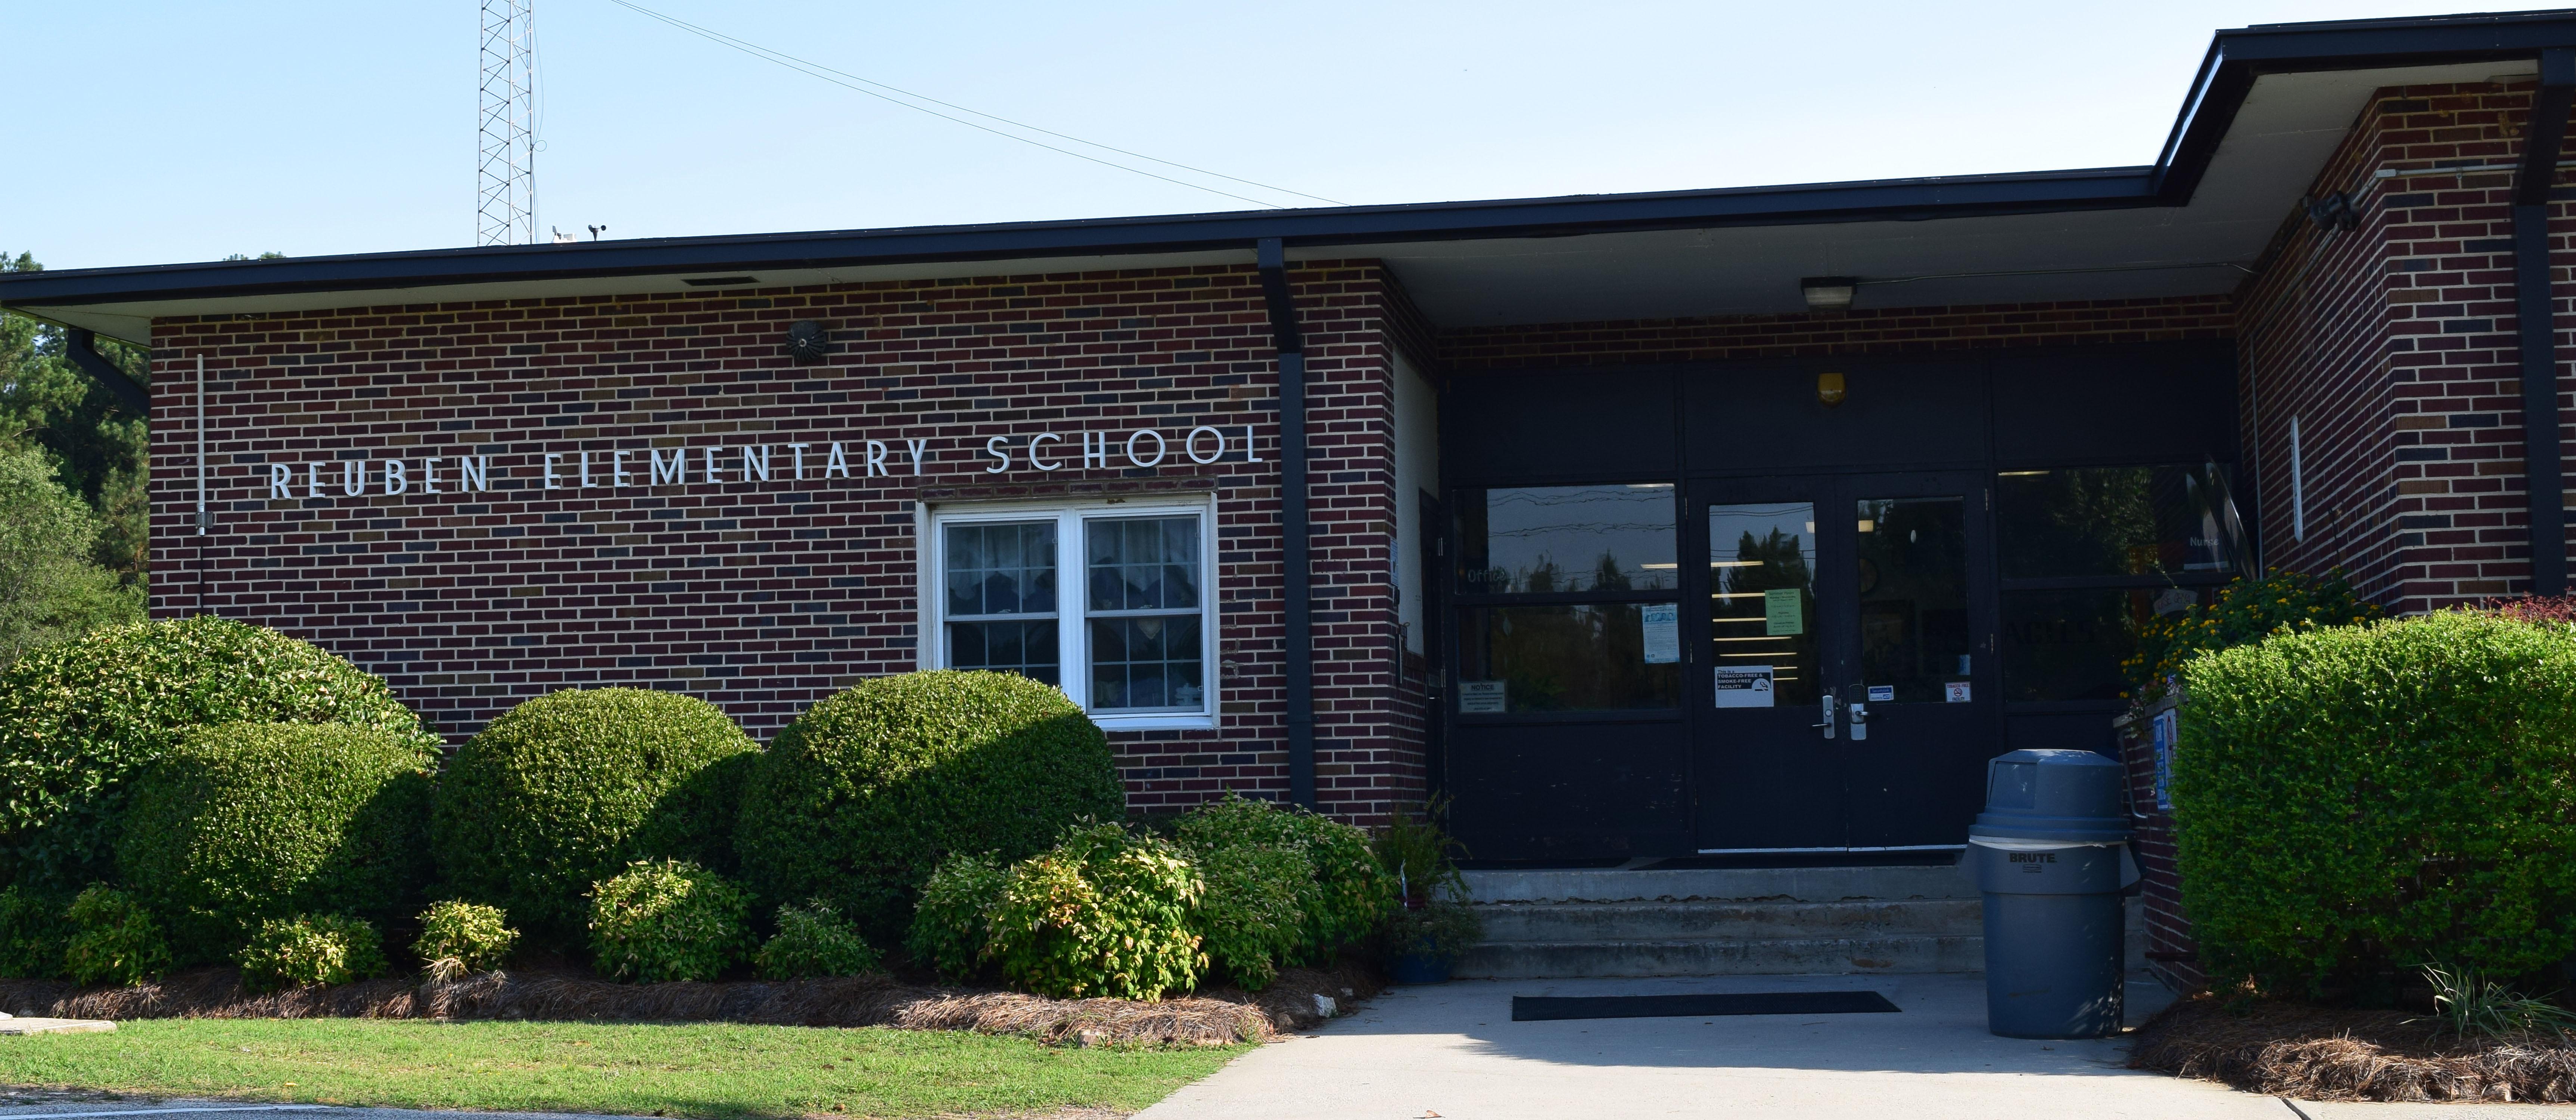 Reuben Elementary